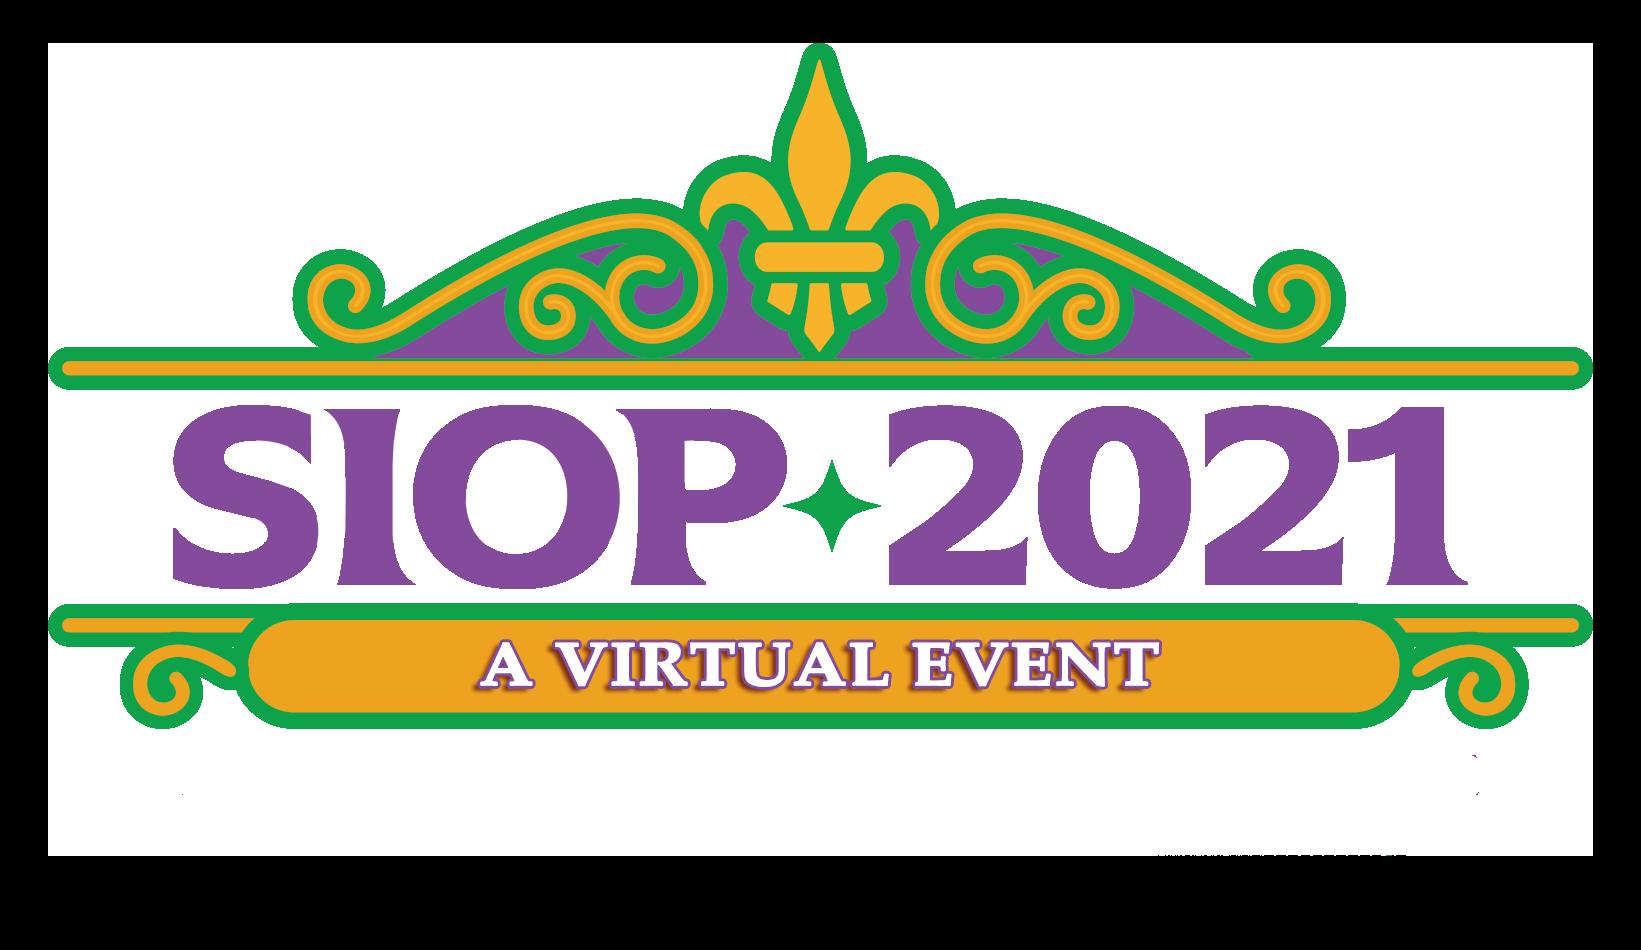 SIOP%202021%20A